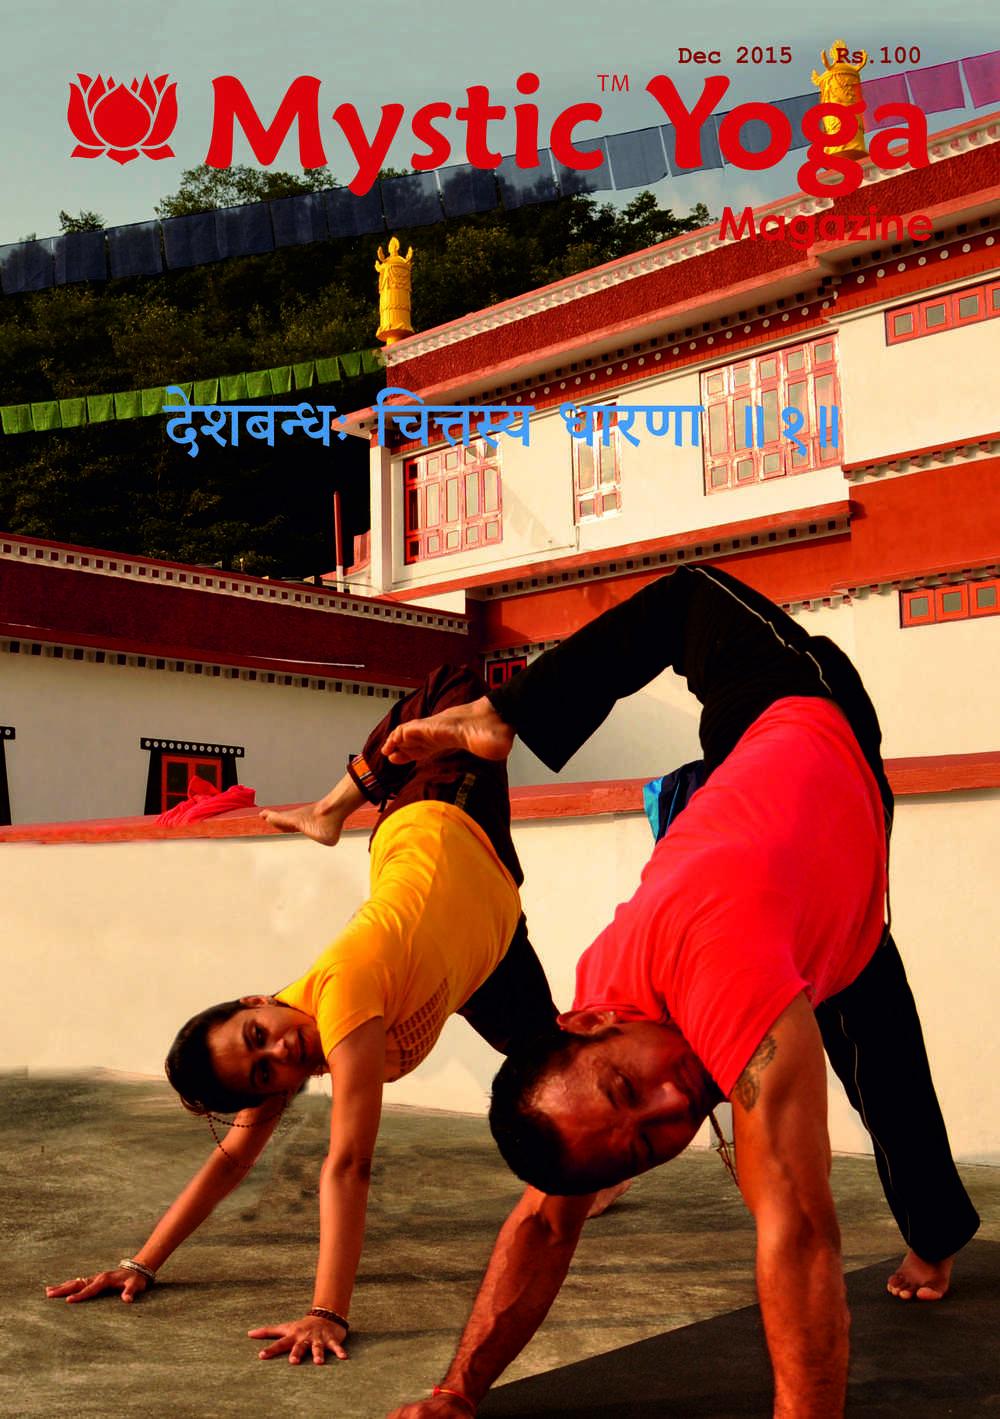 Mystic Yoga Magazine December 2015